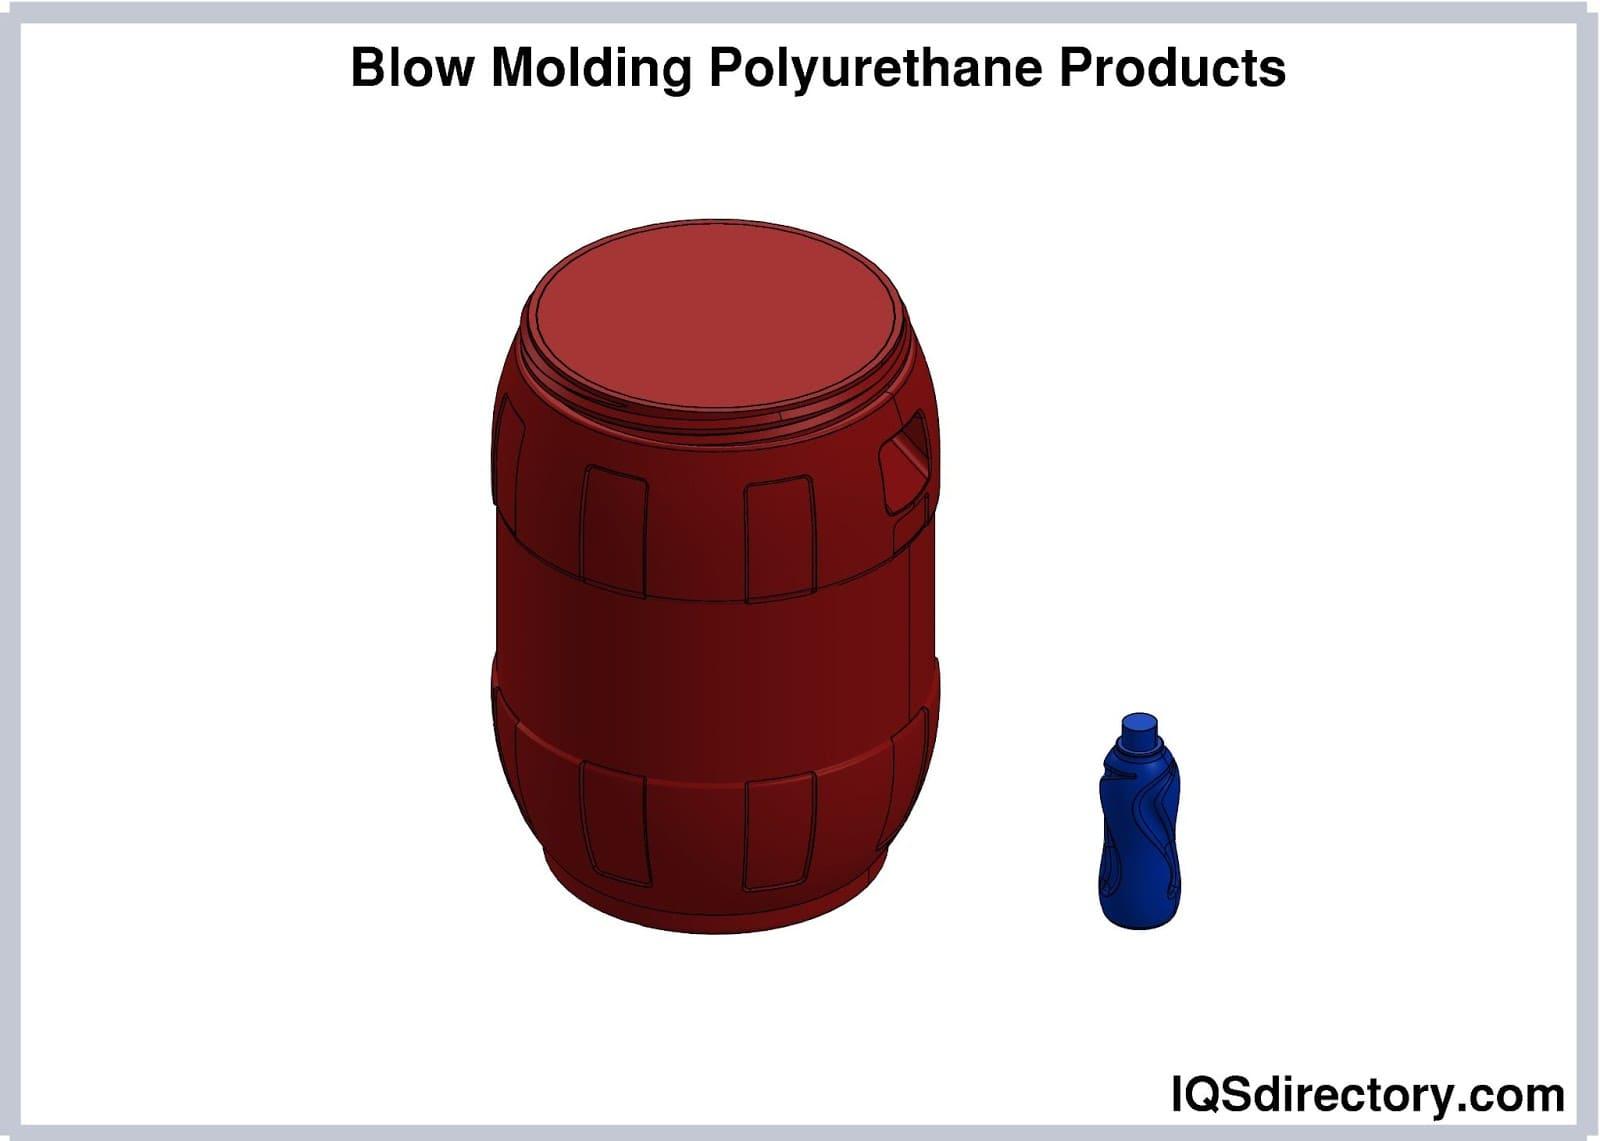 Blow Molding Polyurethane Products